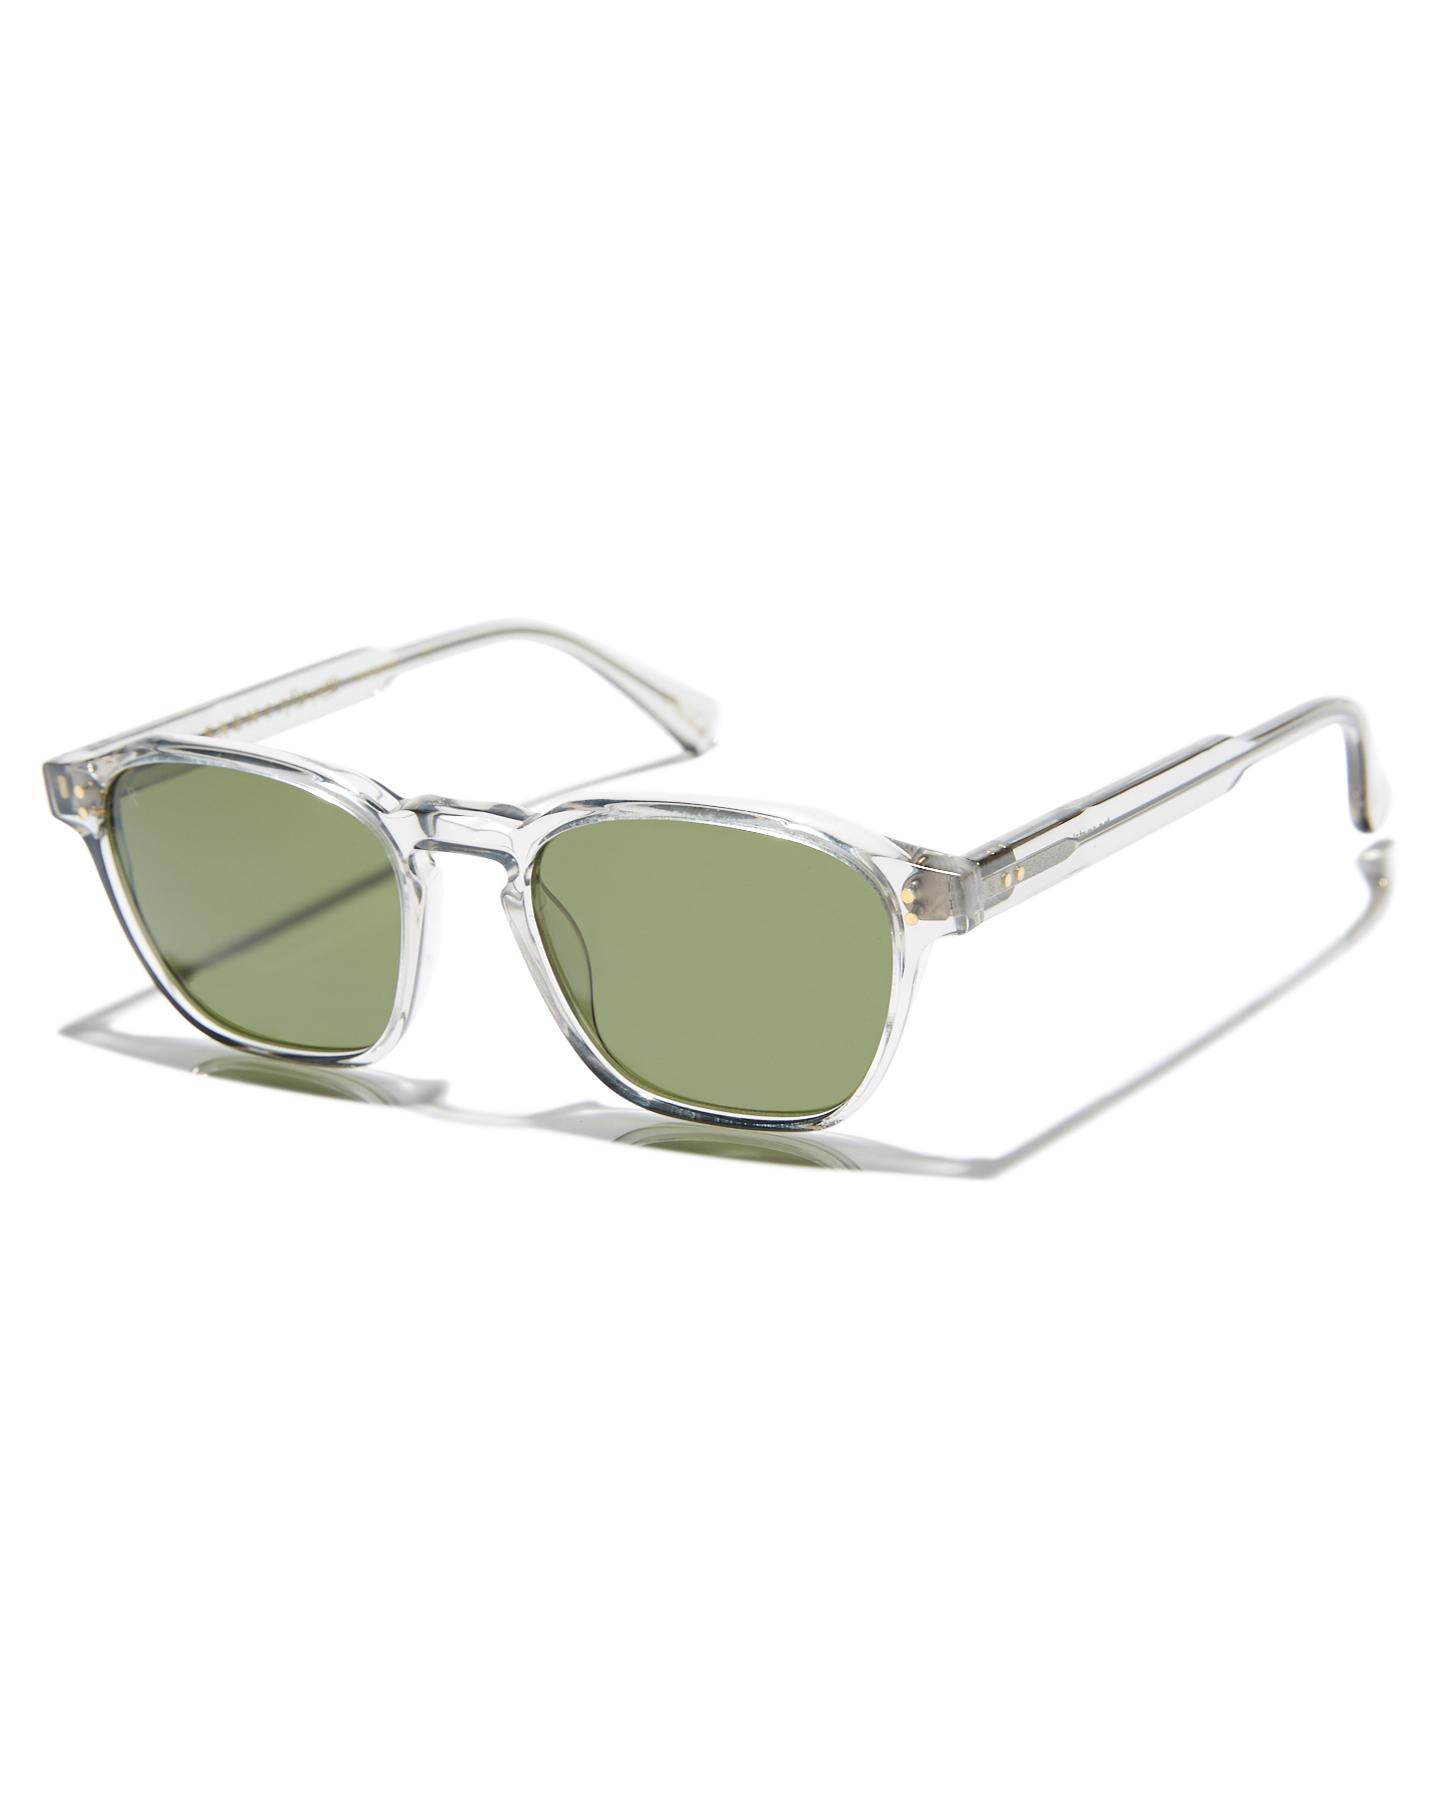 Raen Aren 50 Sunglasses Fog Crystal Green Fog Crystal Green